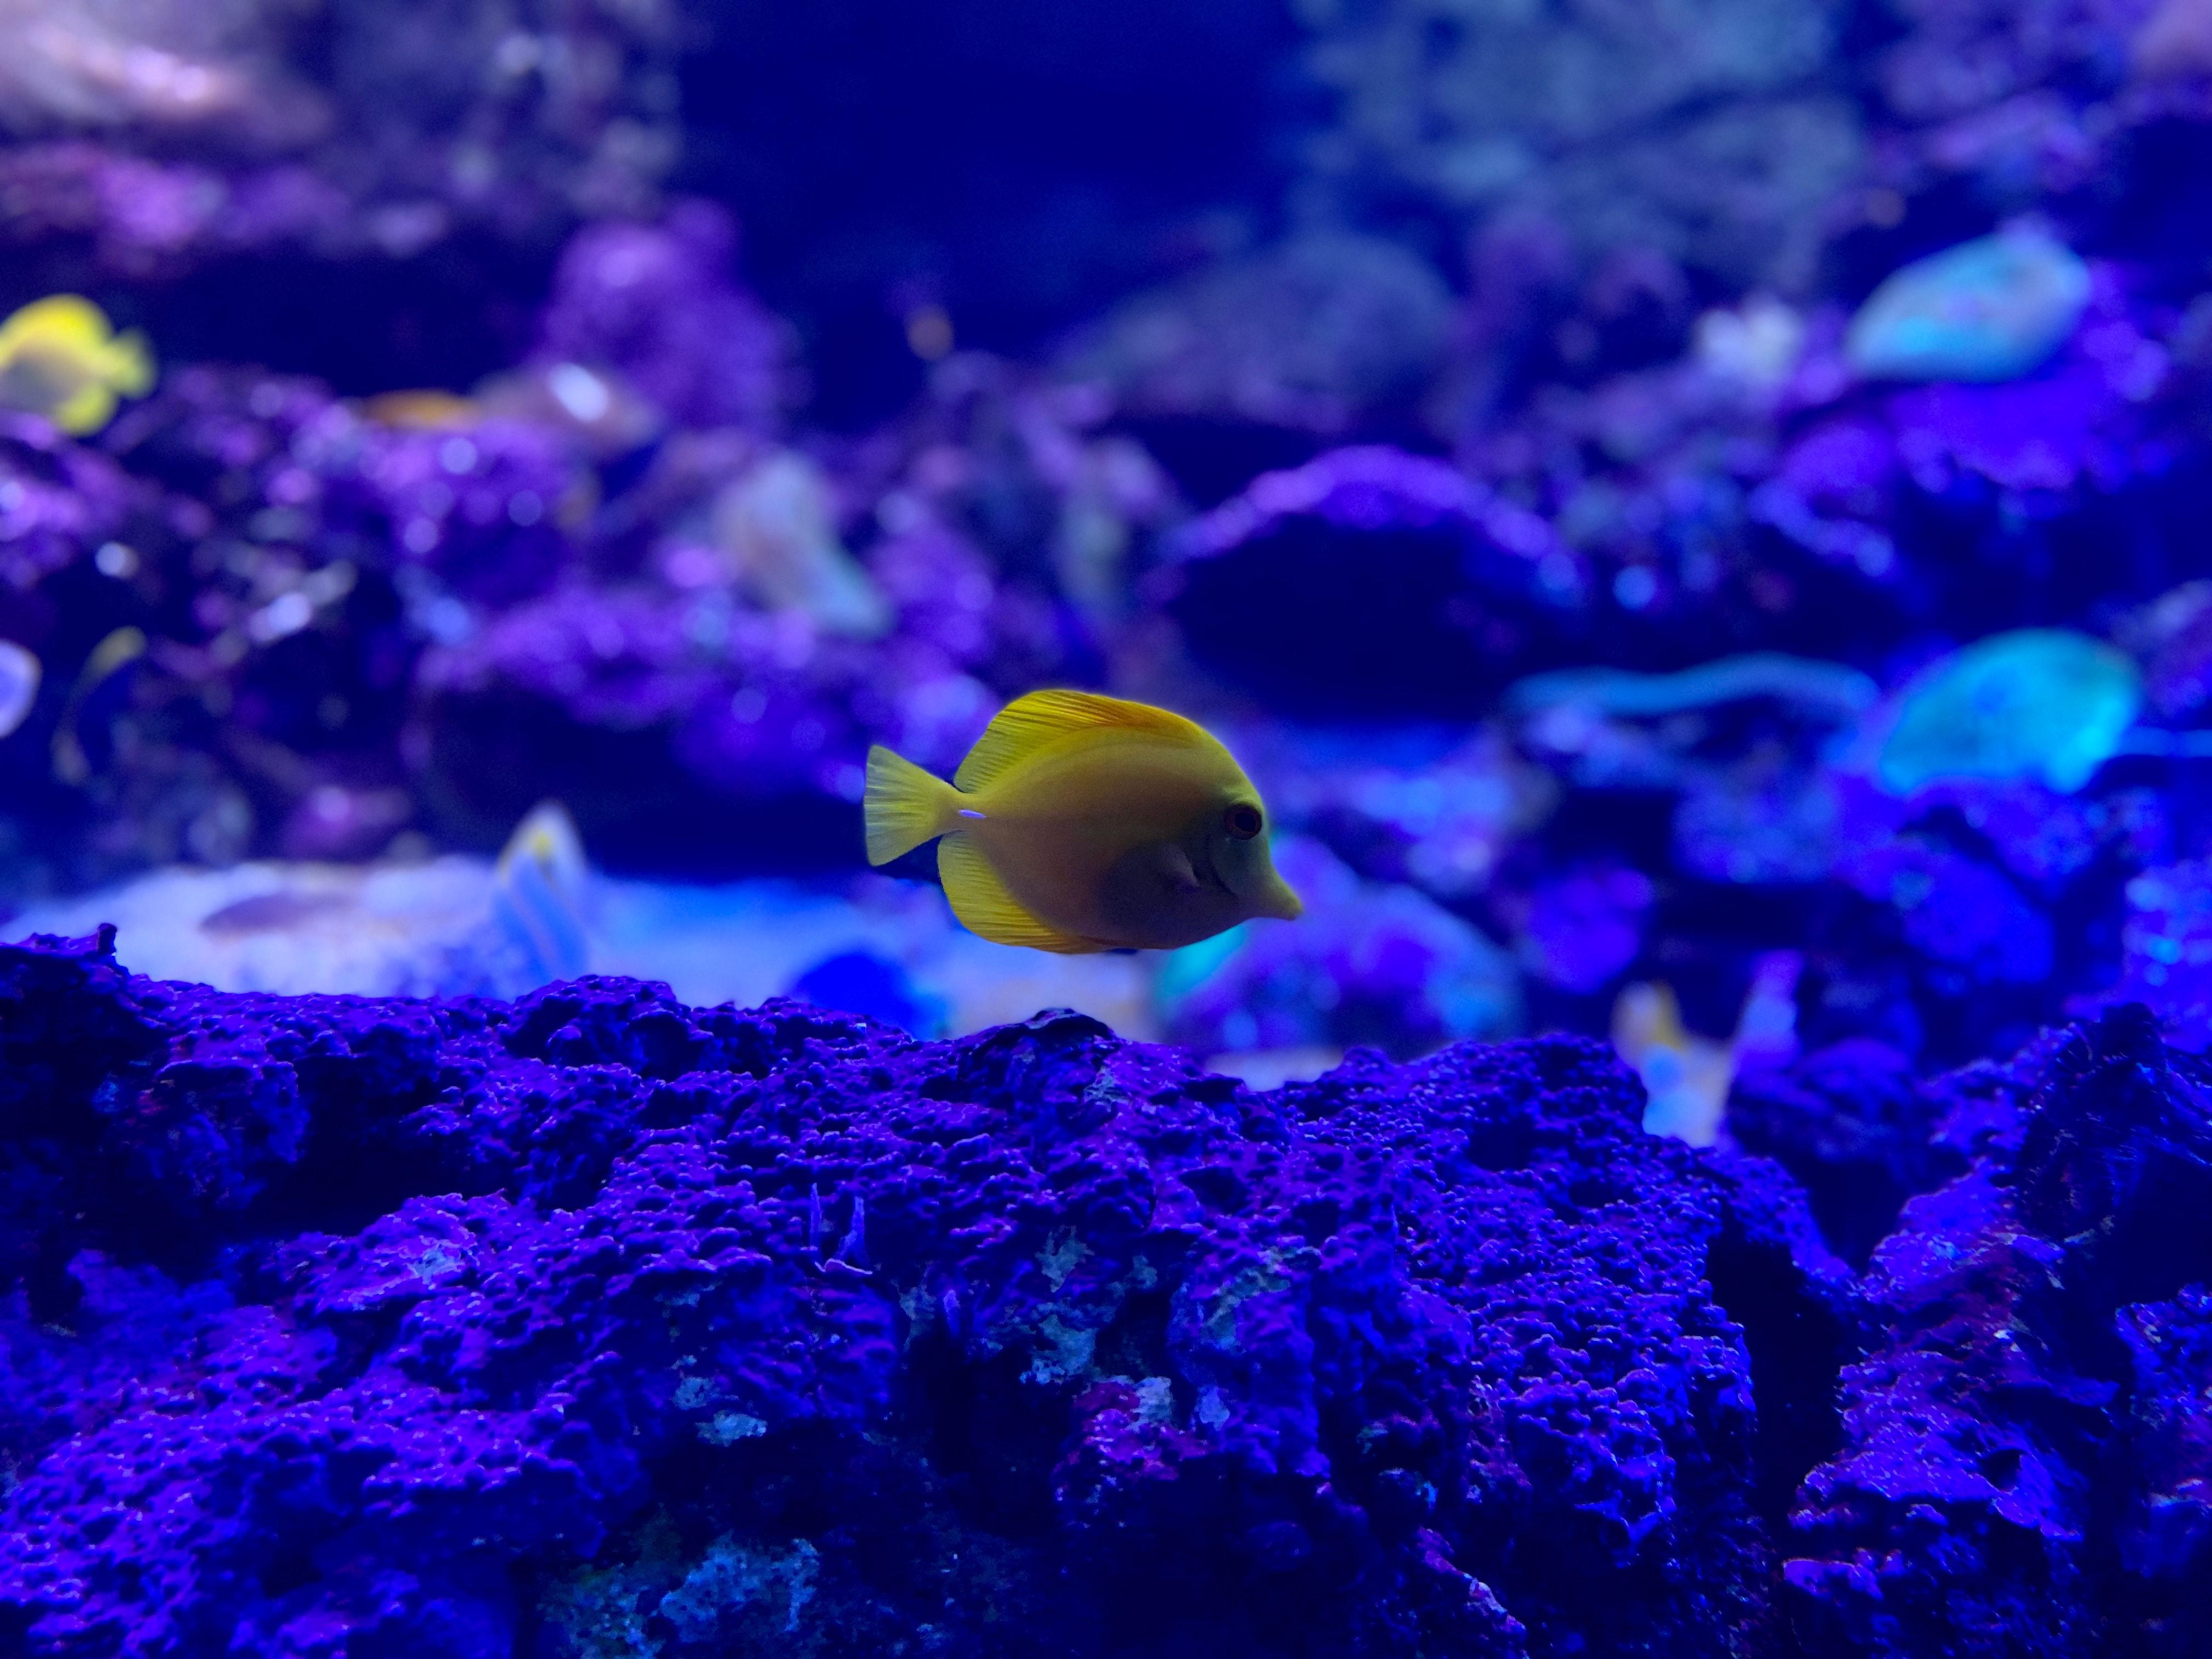 89646 Screensavers and Wallpapers Aquarium for phone. Download Animals, Coral, Aquarium, Fish, Zebrasoma pictures for free